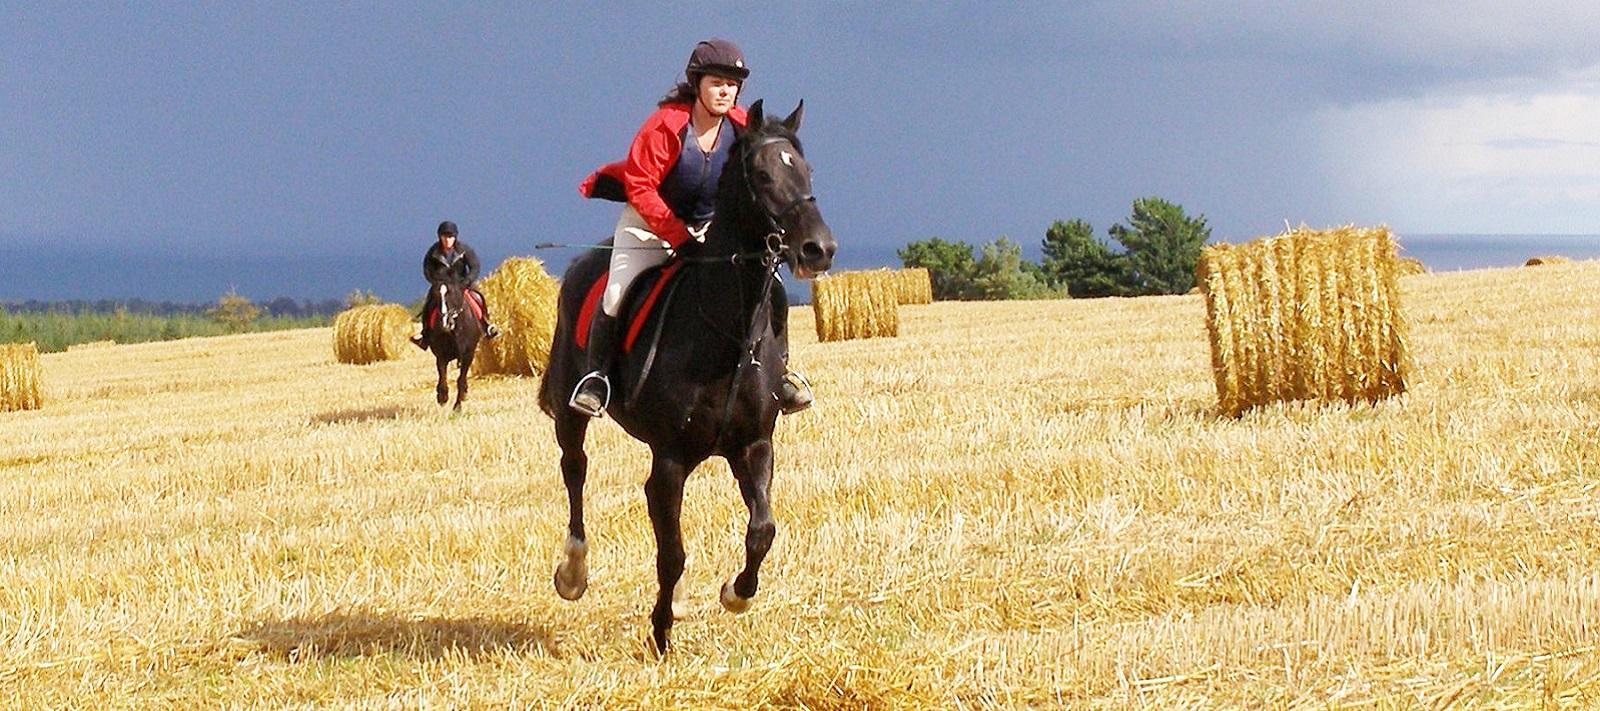 Golden Gallop Across A Stubble Field At Bel-Air Equestrian